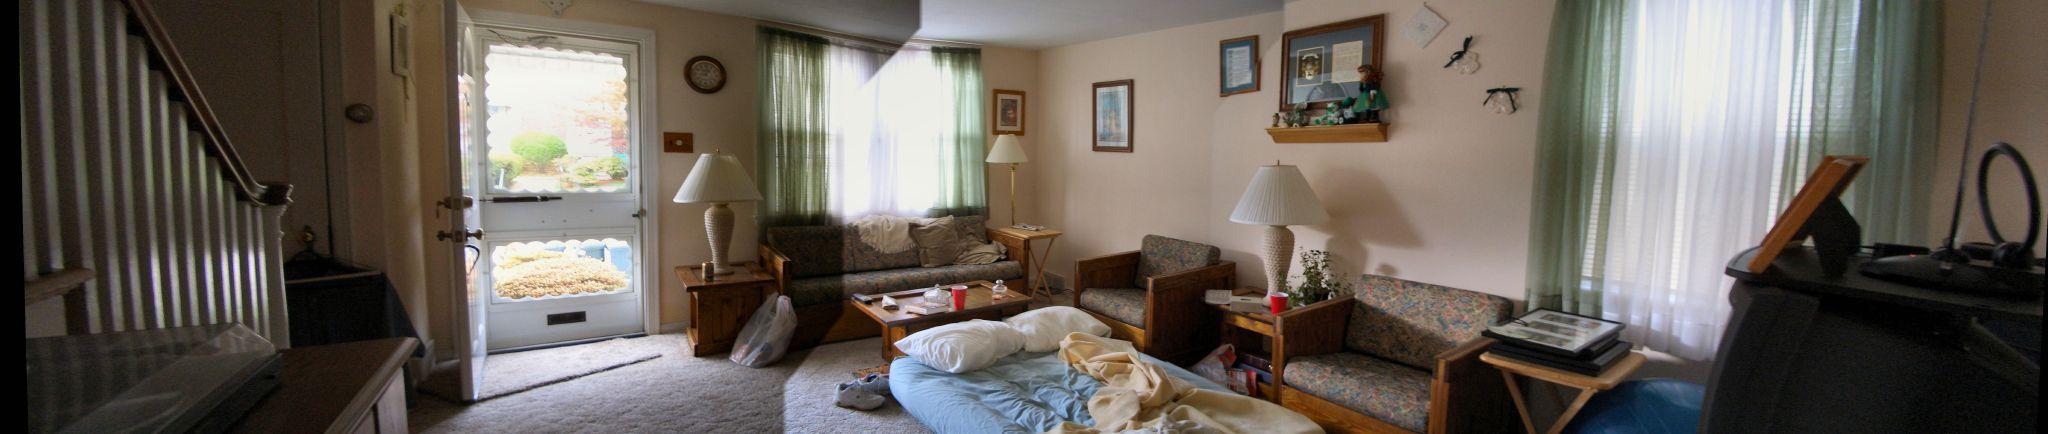 File:Living Room In Philadelphia, USA